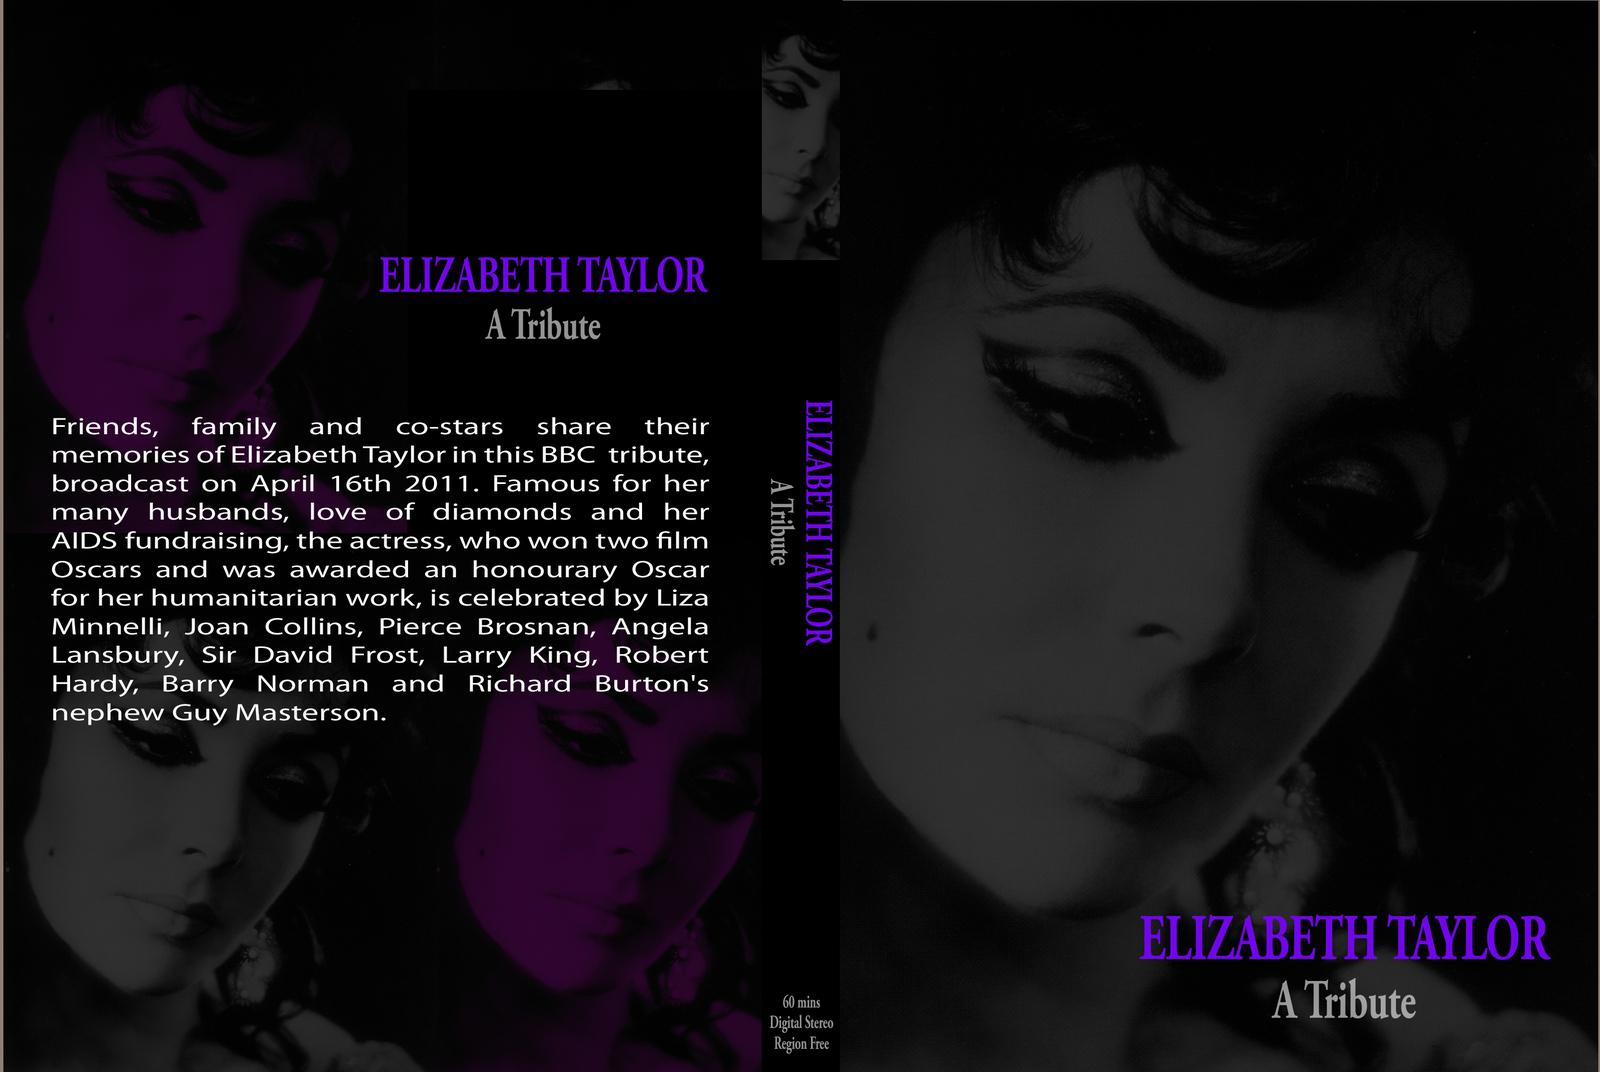 Elizabeth taylor   a tribute